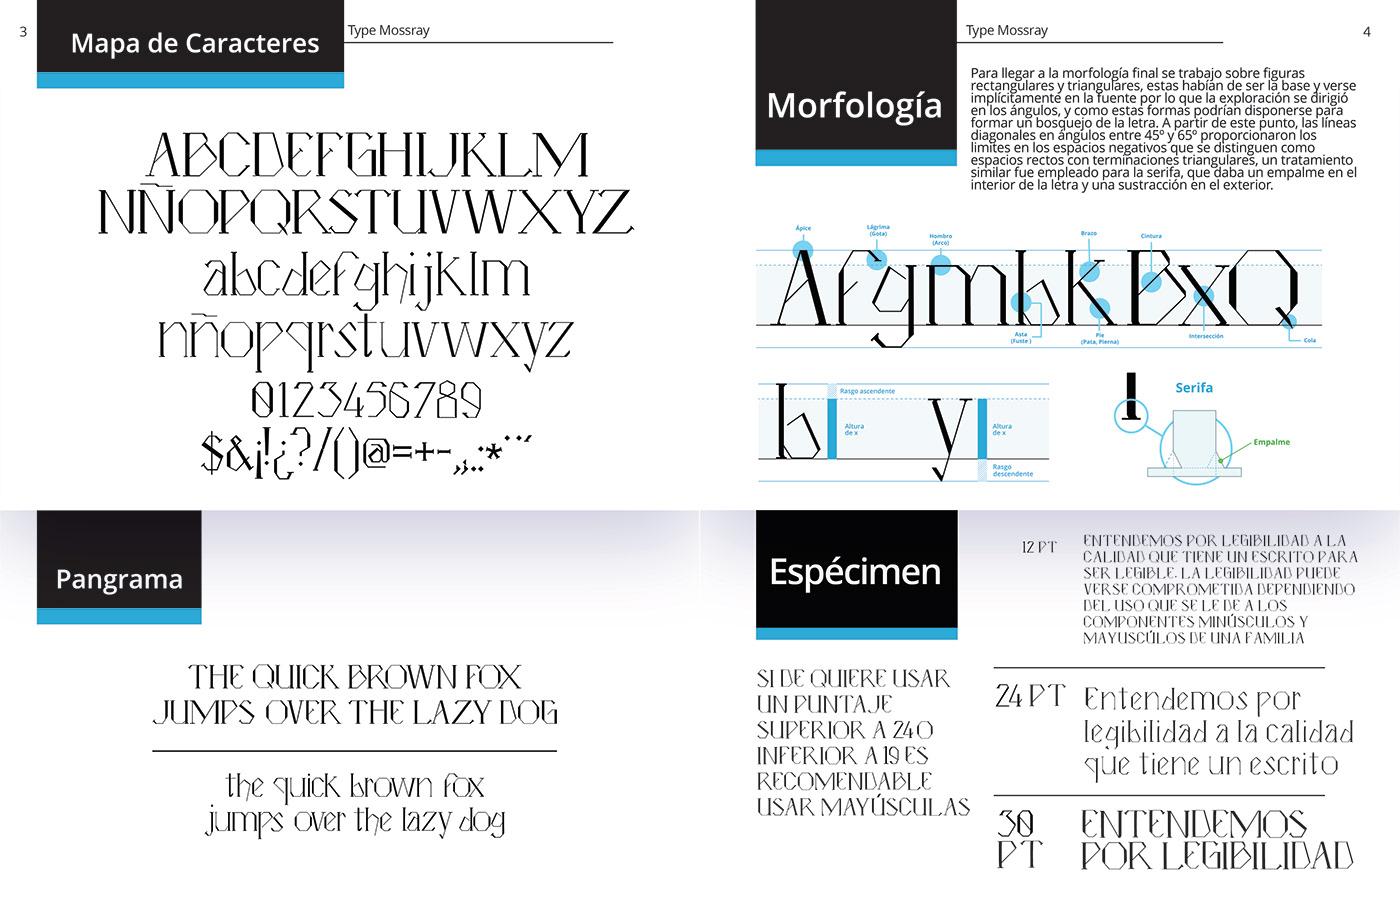 Carta Tipográfica / Type Mossray 39c04e72765867.5bf2e5b4b85a7